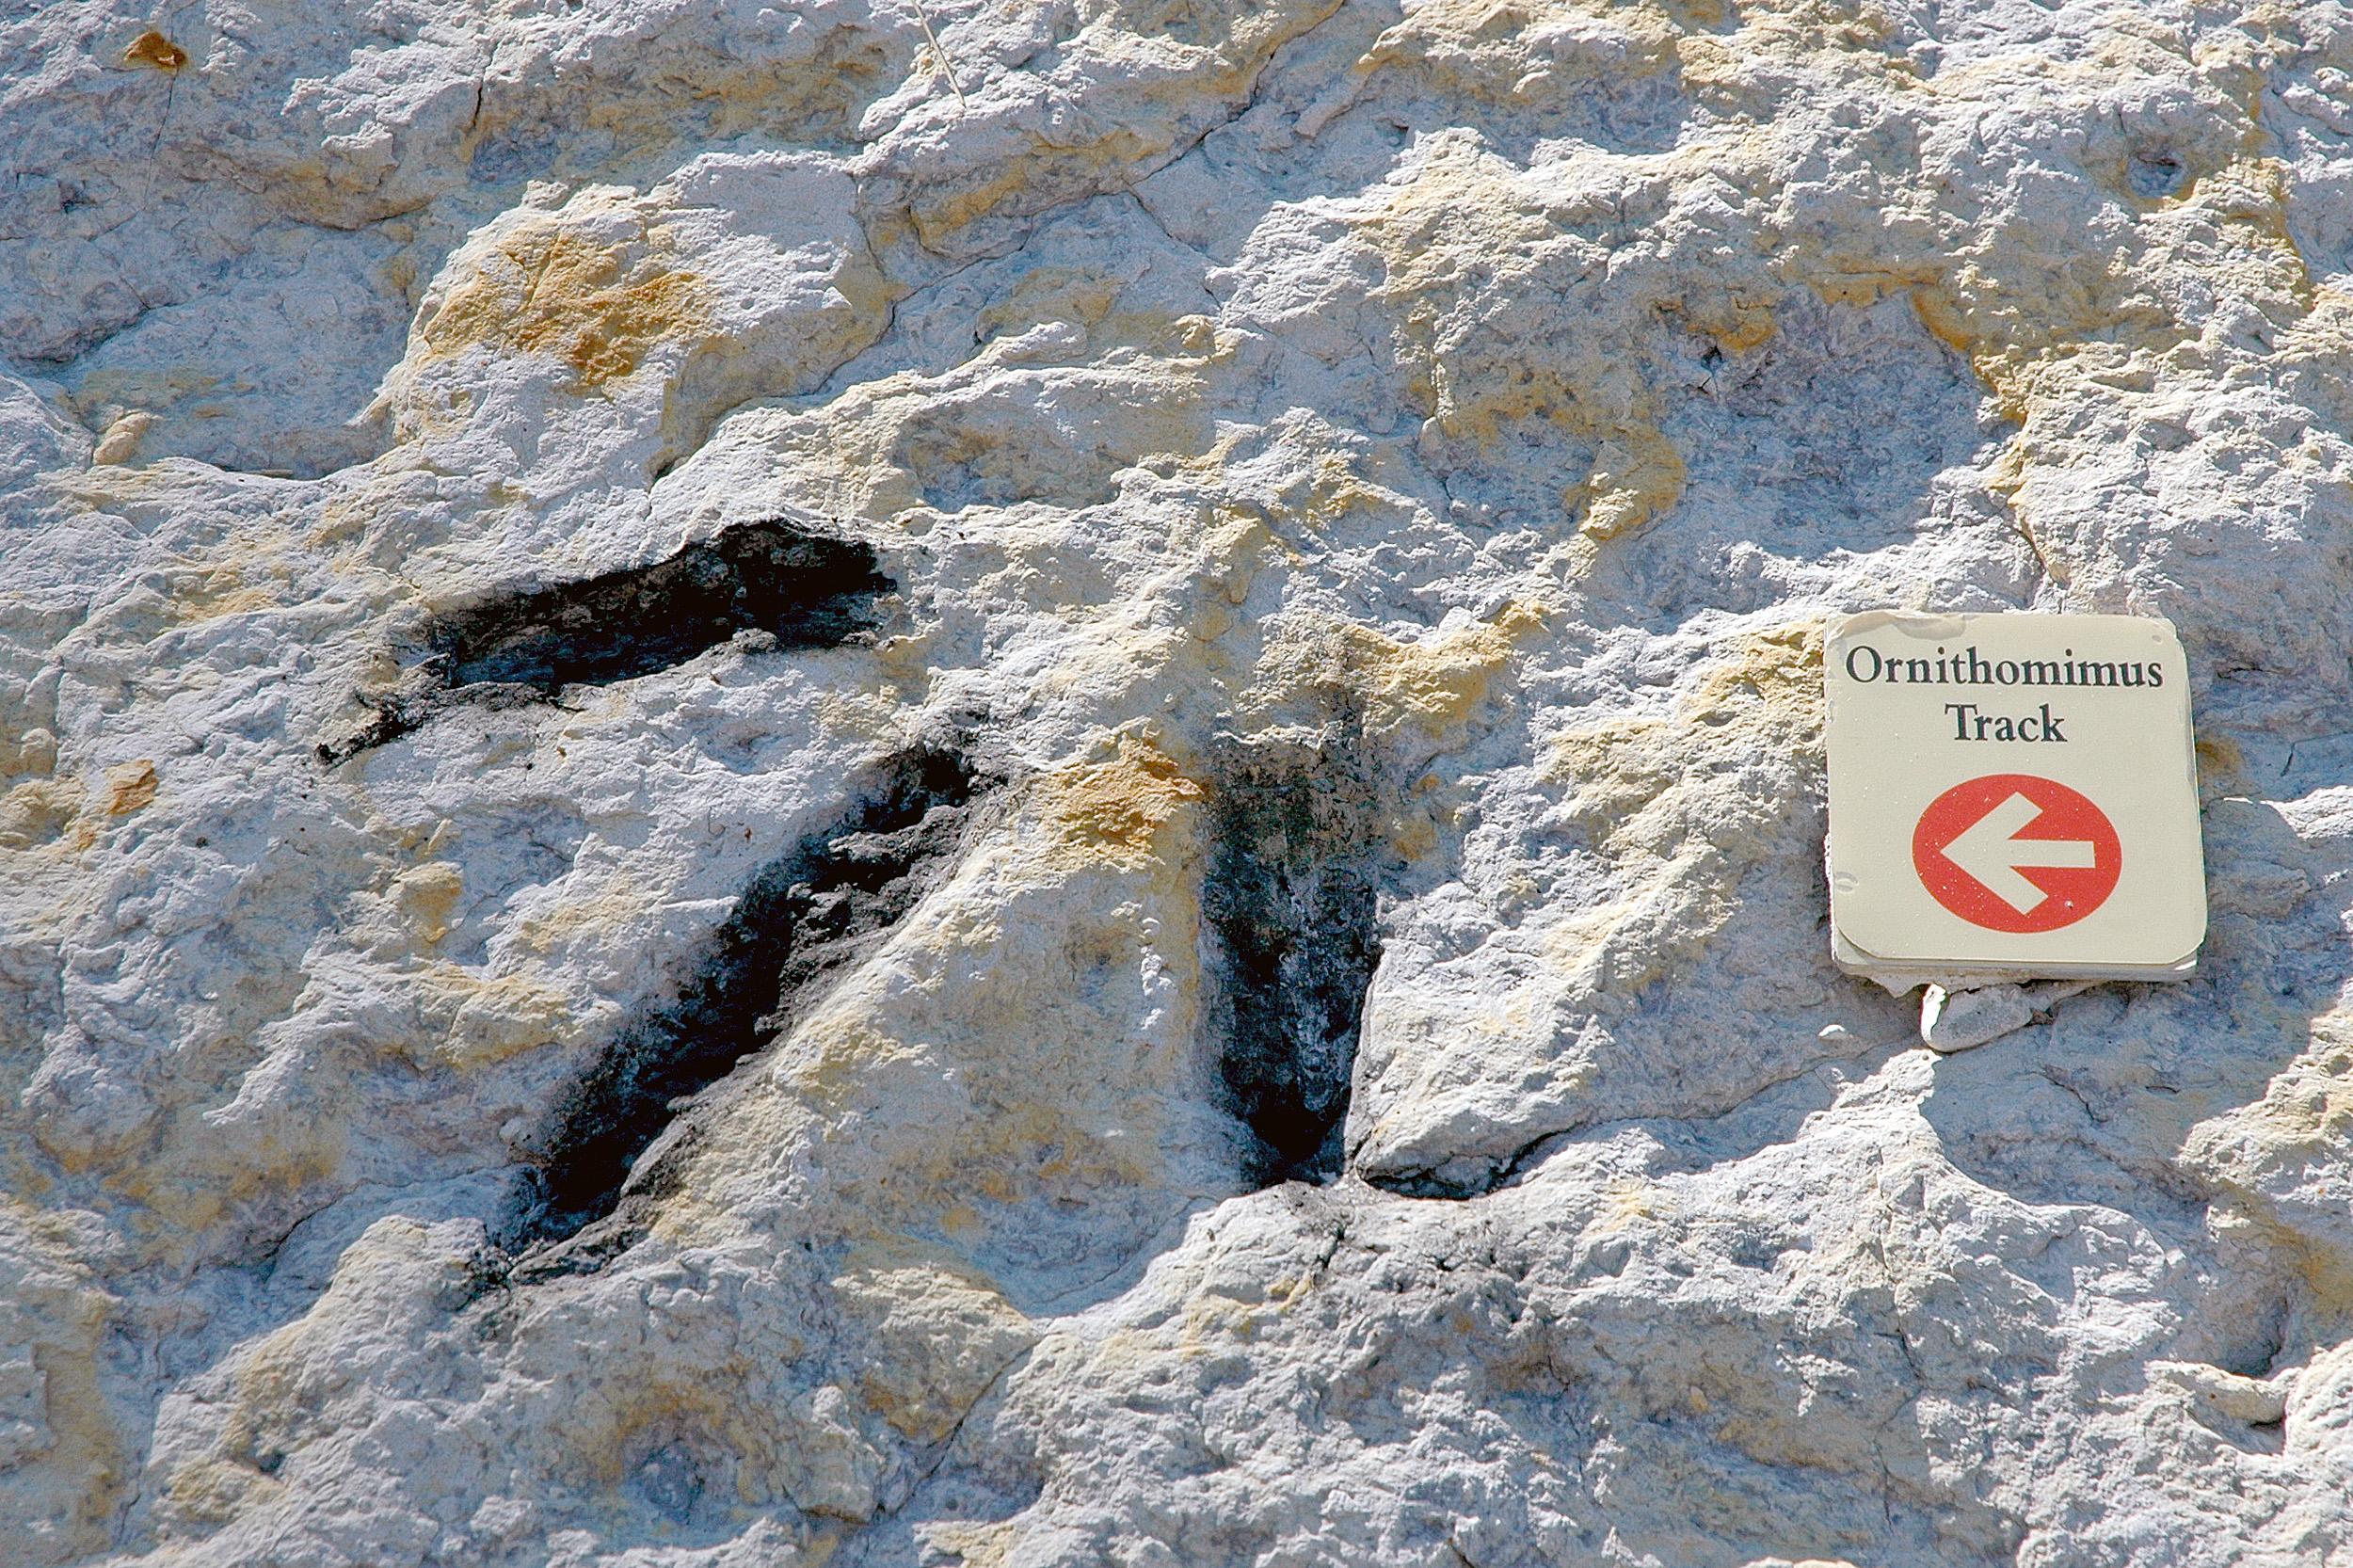 Ornithomimus Dinosaur Ridge denver colorado